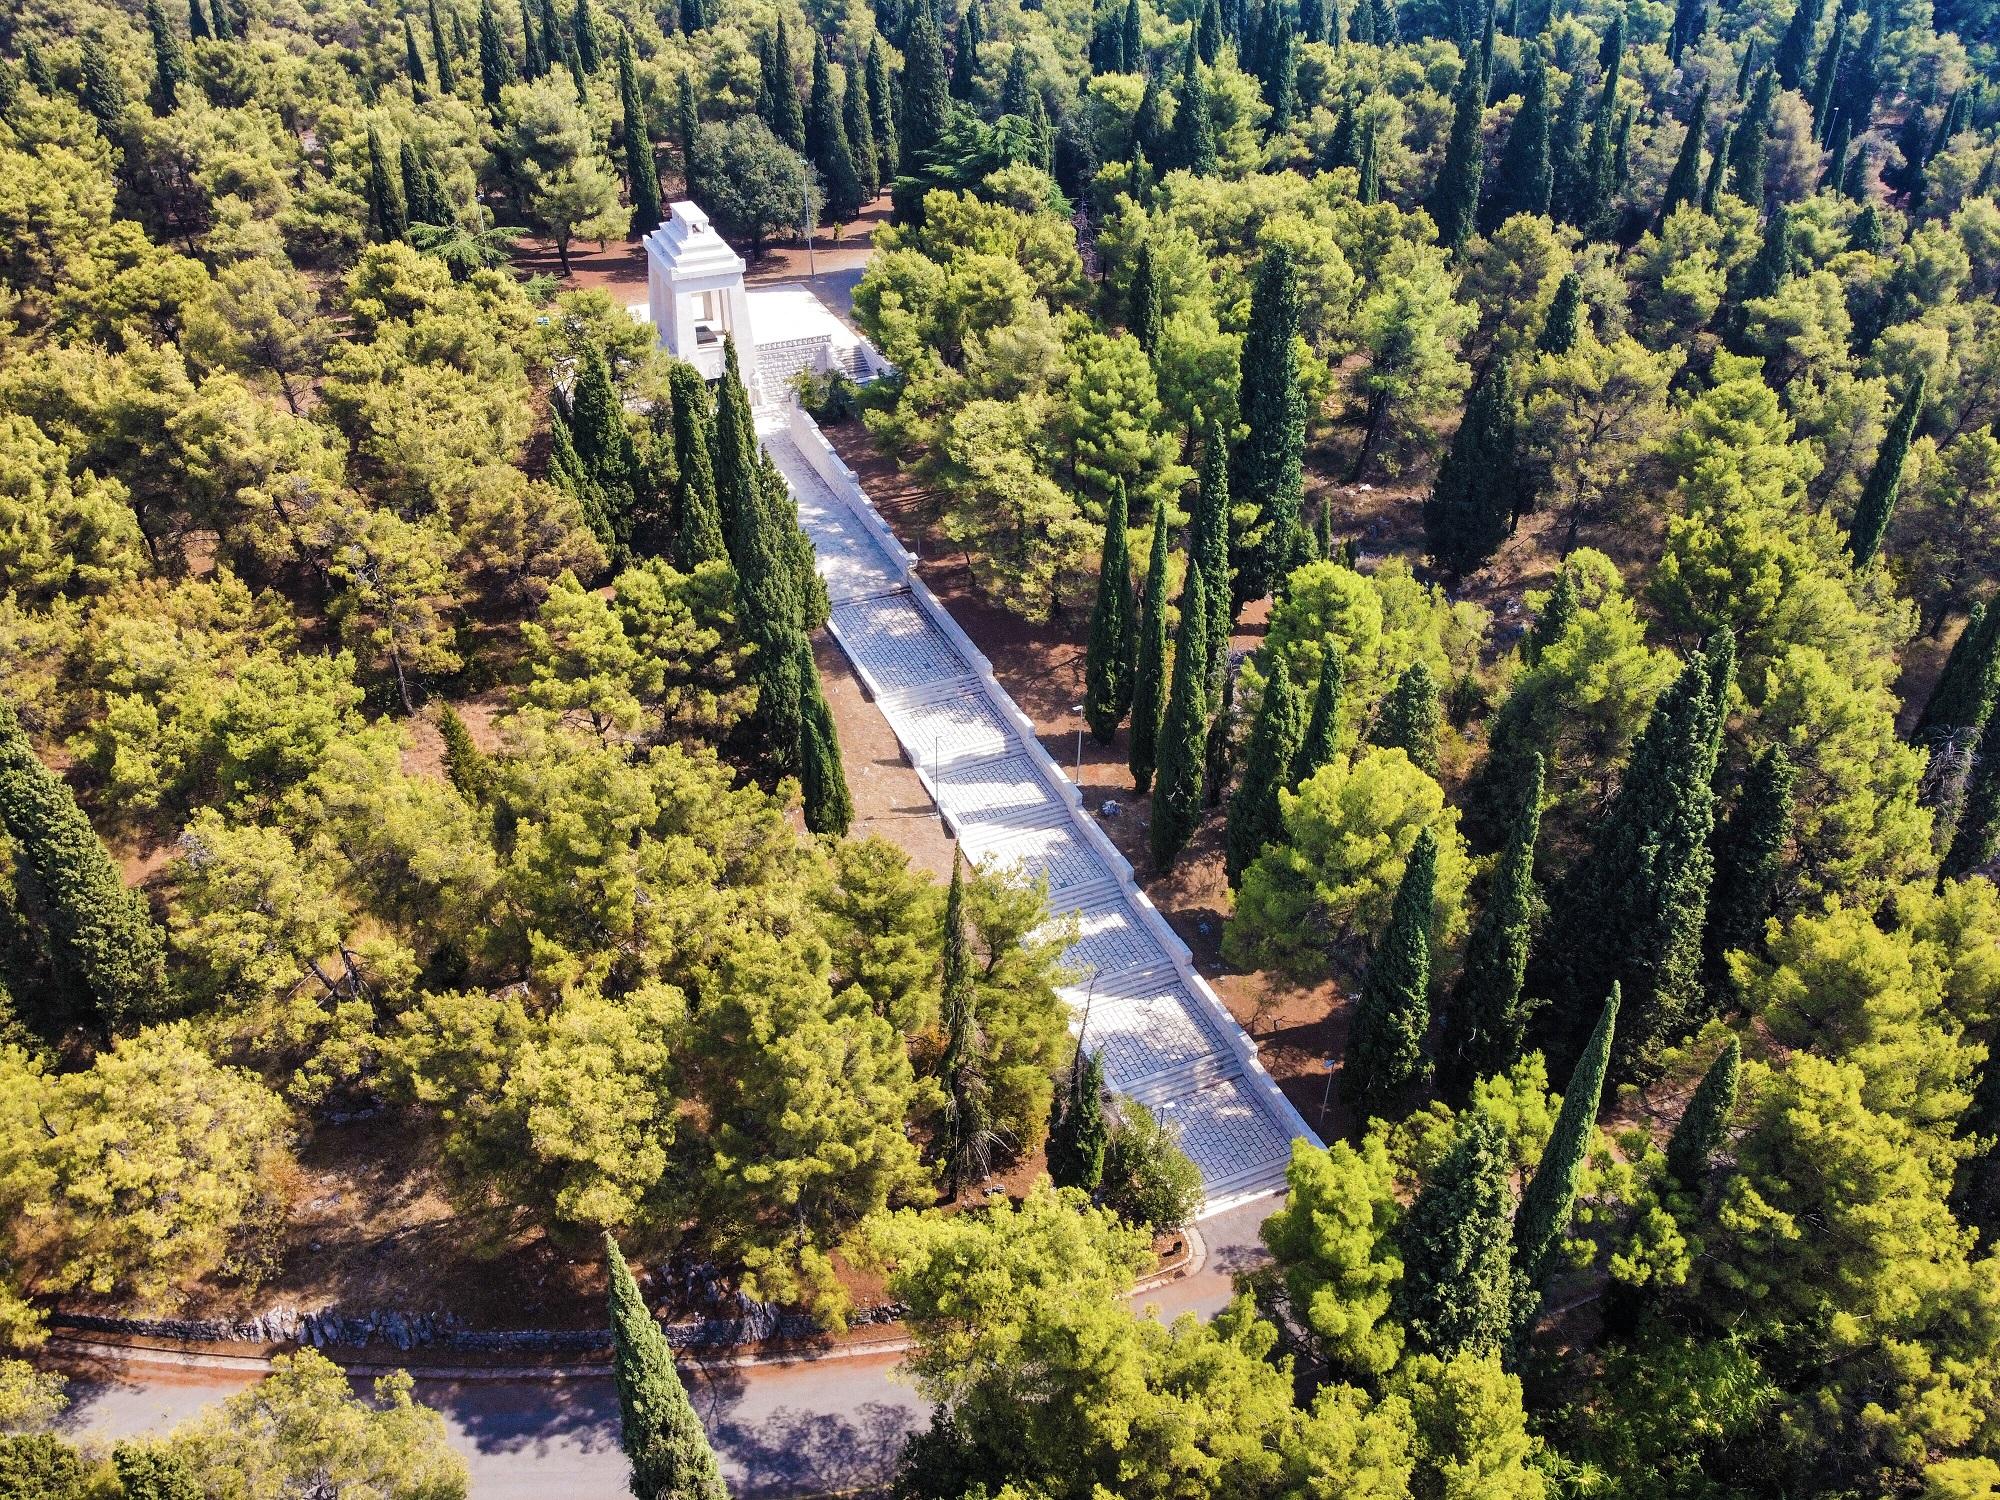 Velika akcija čišćenja brda Gorica